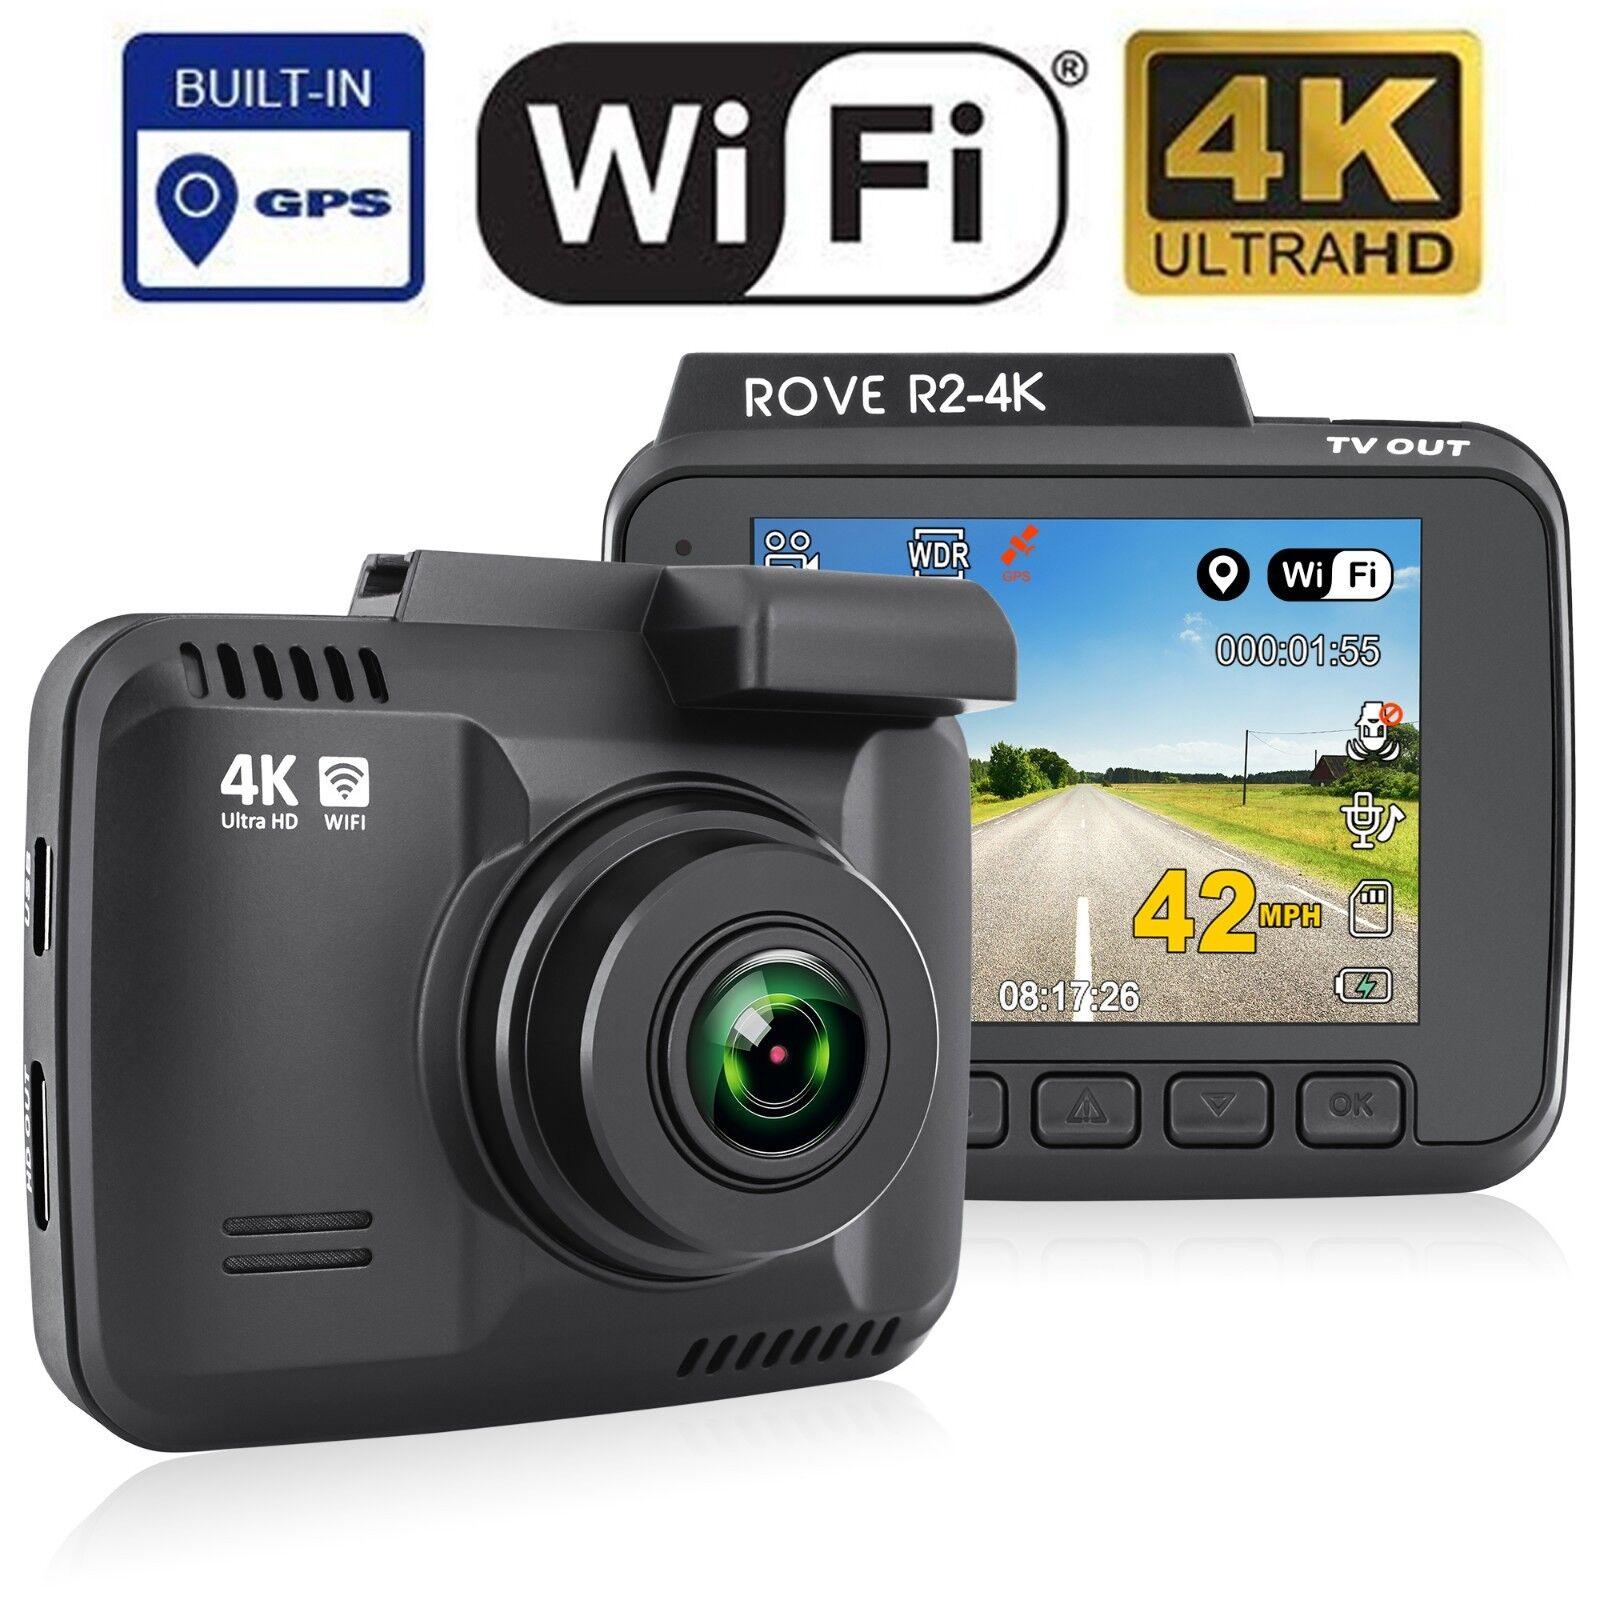 s-l1600 Rove R2-4K Car Dash Cam - 4K Ultra HD 2160P - Built-In WiFi & GPS, Parking Mode